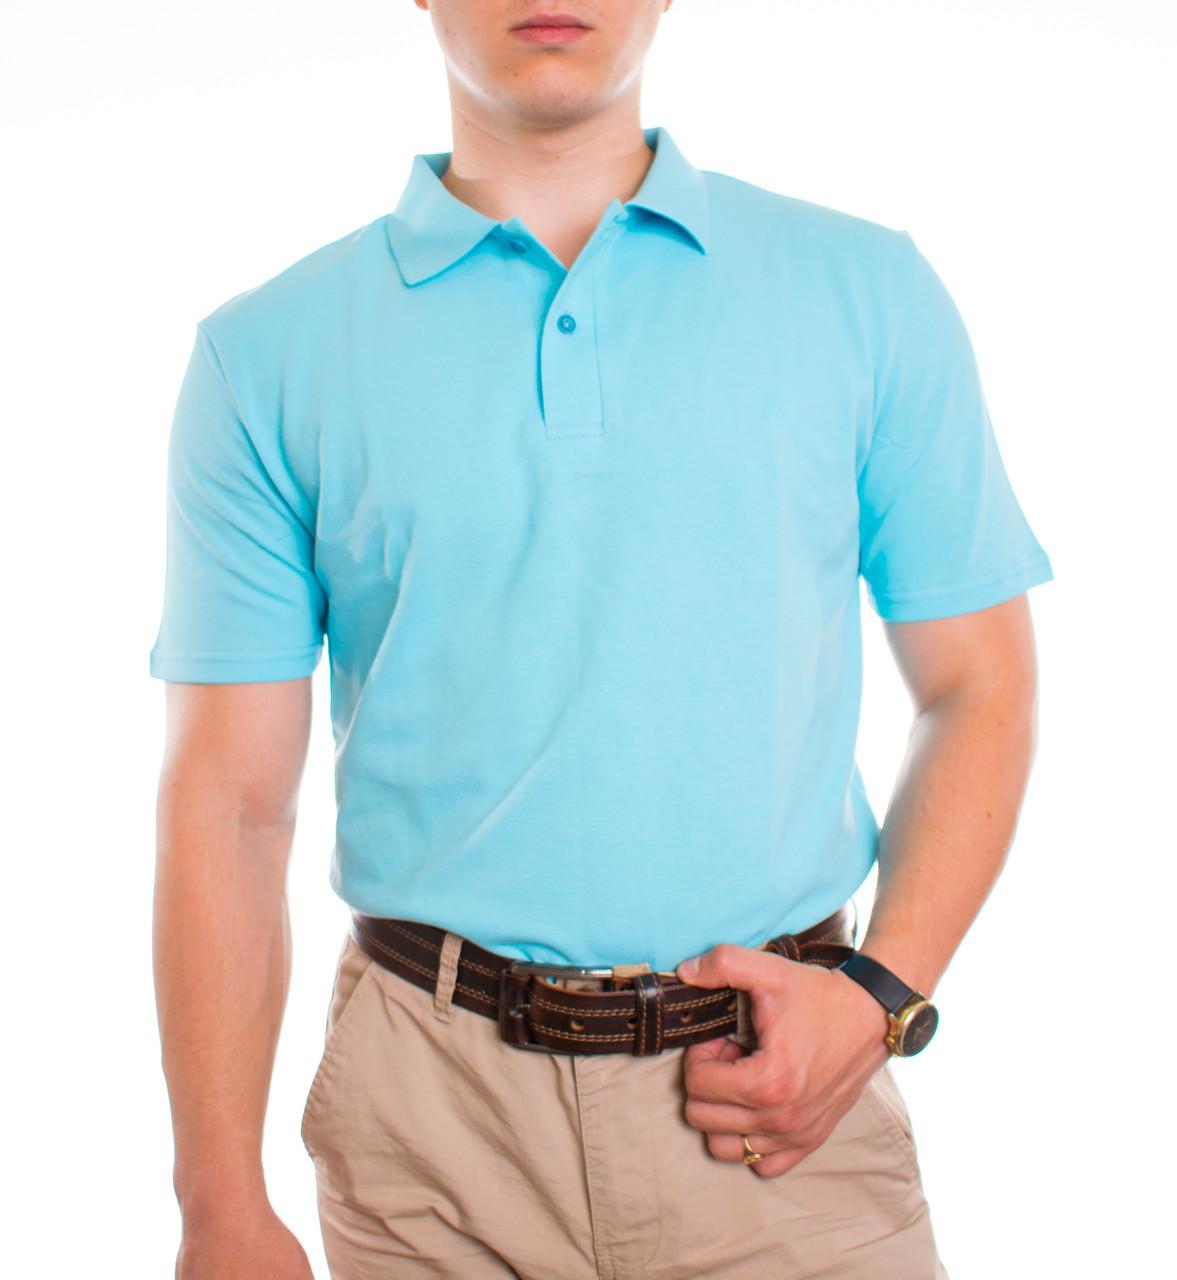 Bono Мужская футболка Поло голубой 400115